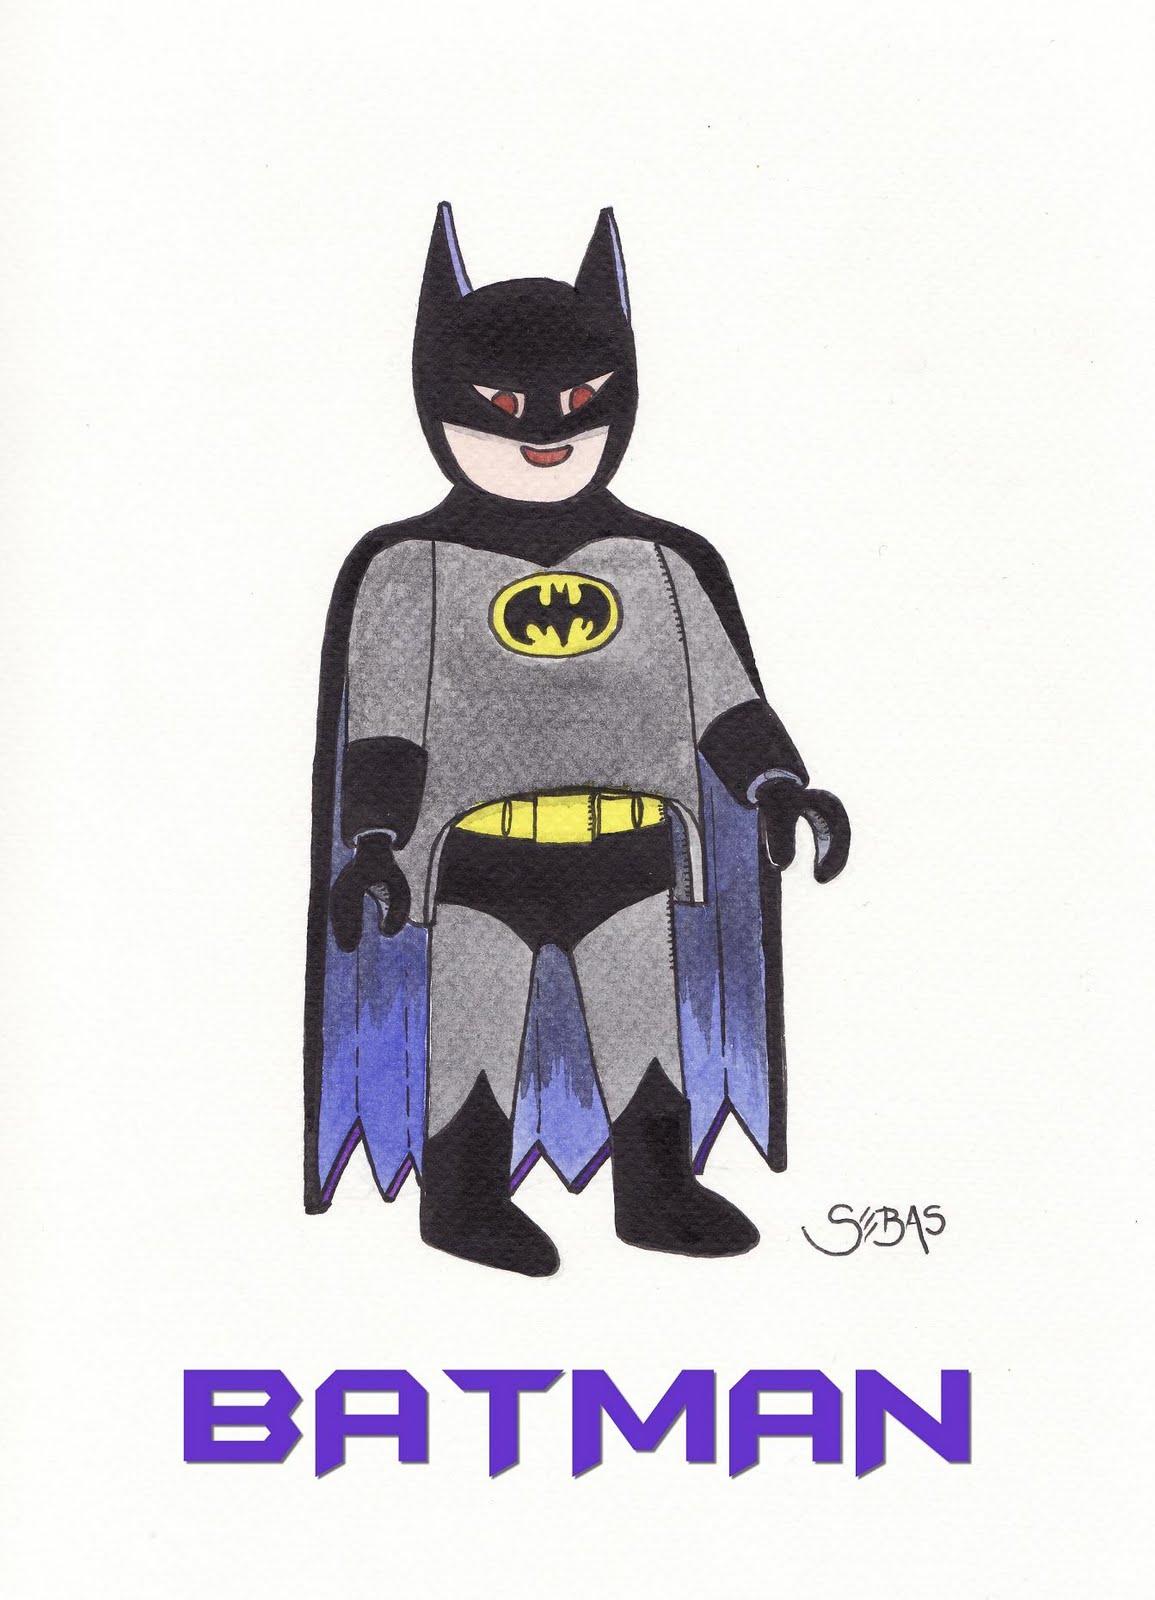 La estanteria de mi casa batman versi n playmobil - Batman playmobil ...